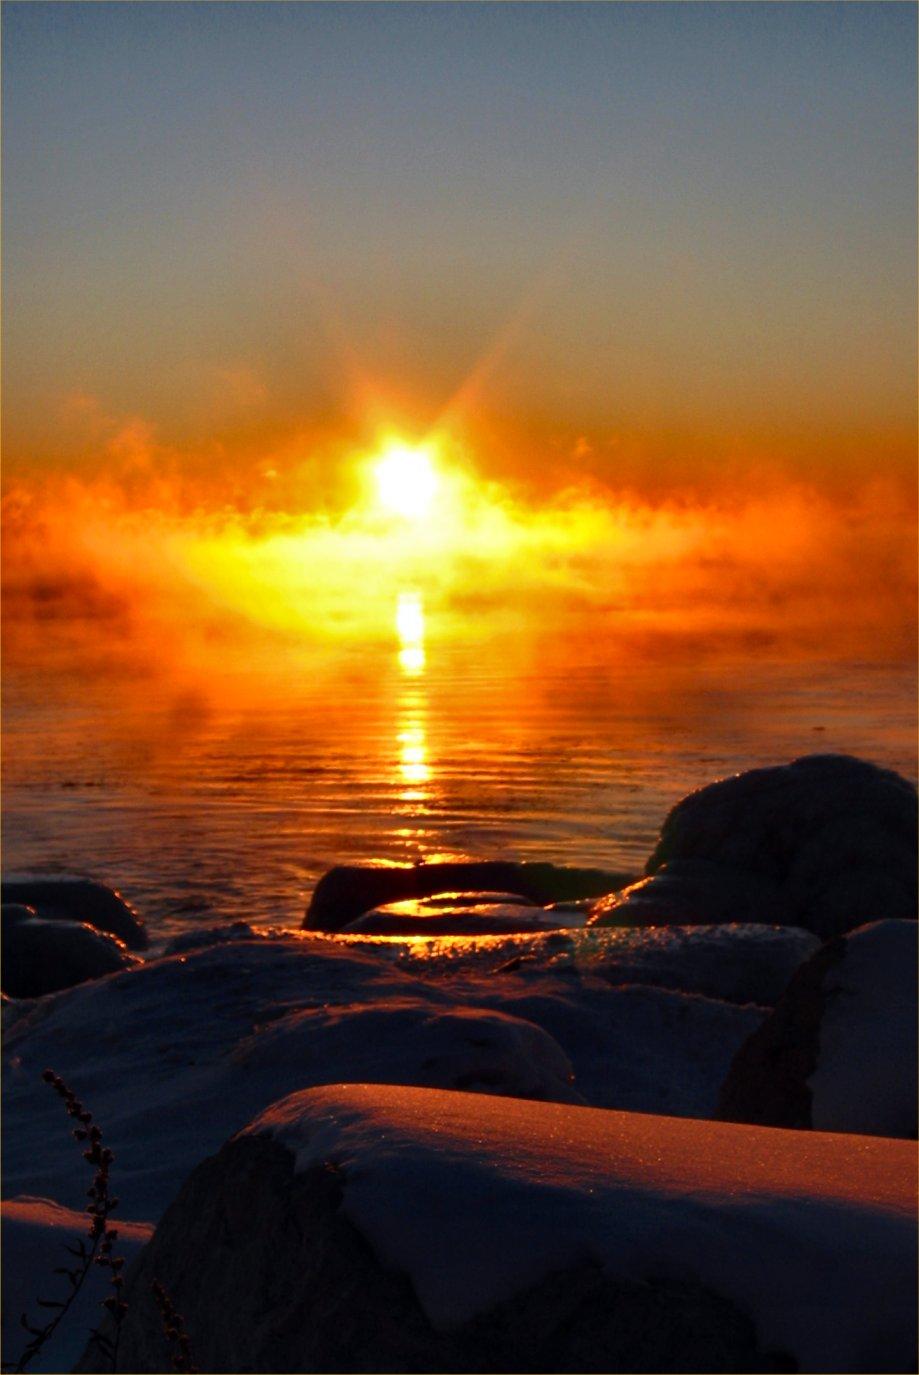 soul amp golden sunrise in mist on lake michigan with. Black Bedroom Furniture Sets. Home Design Ideas